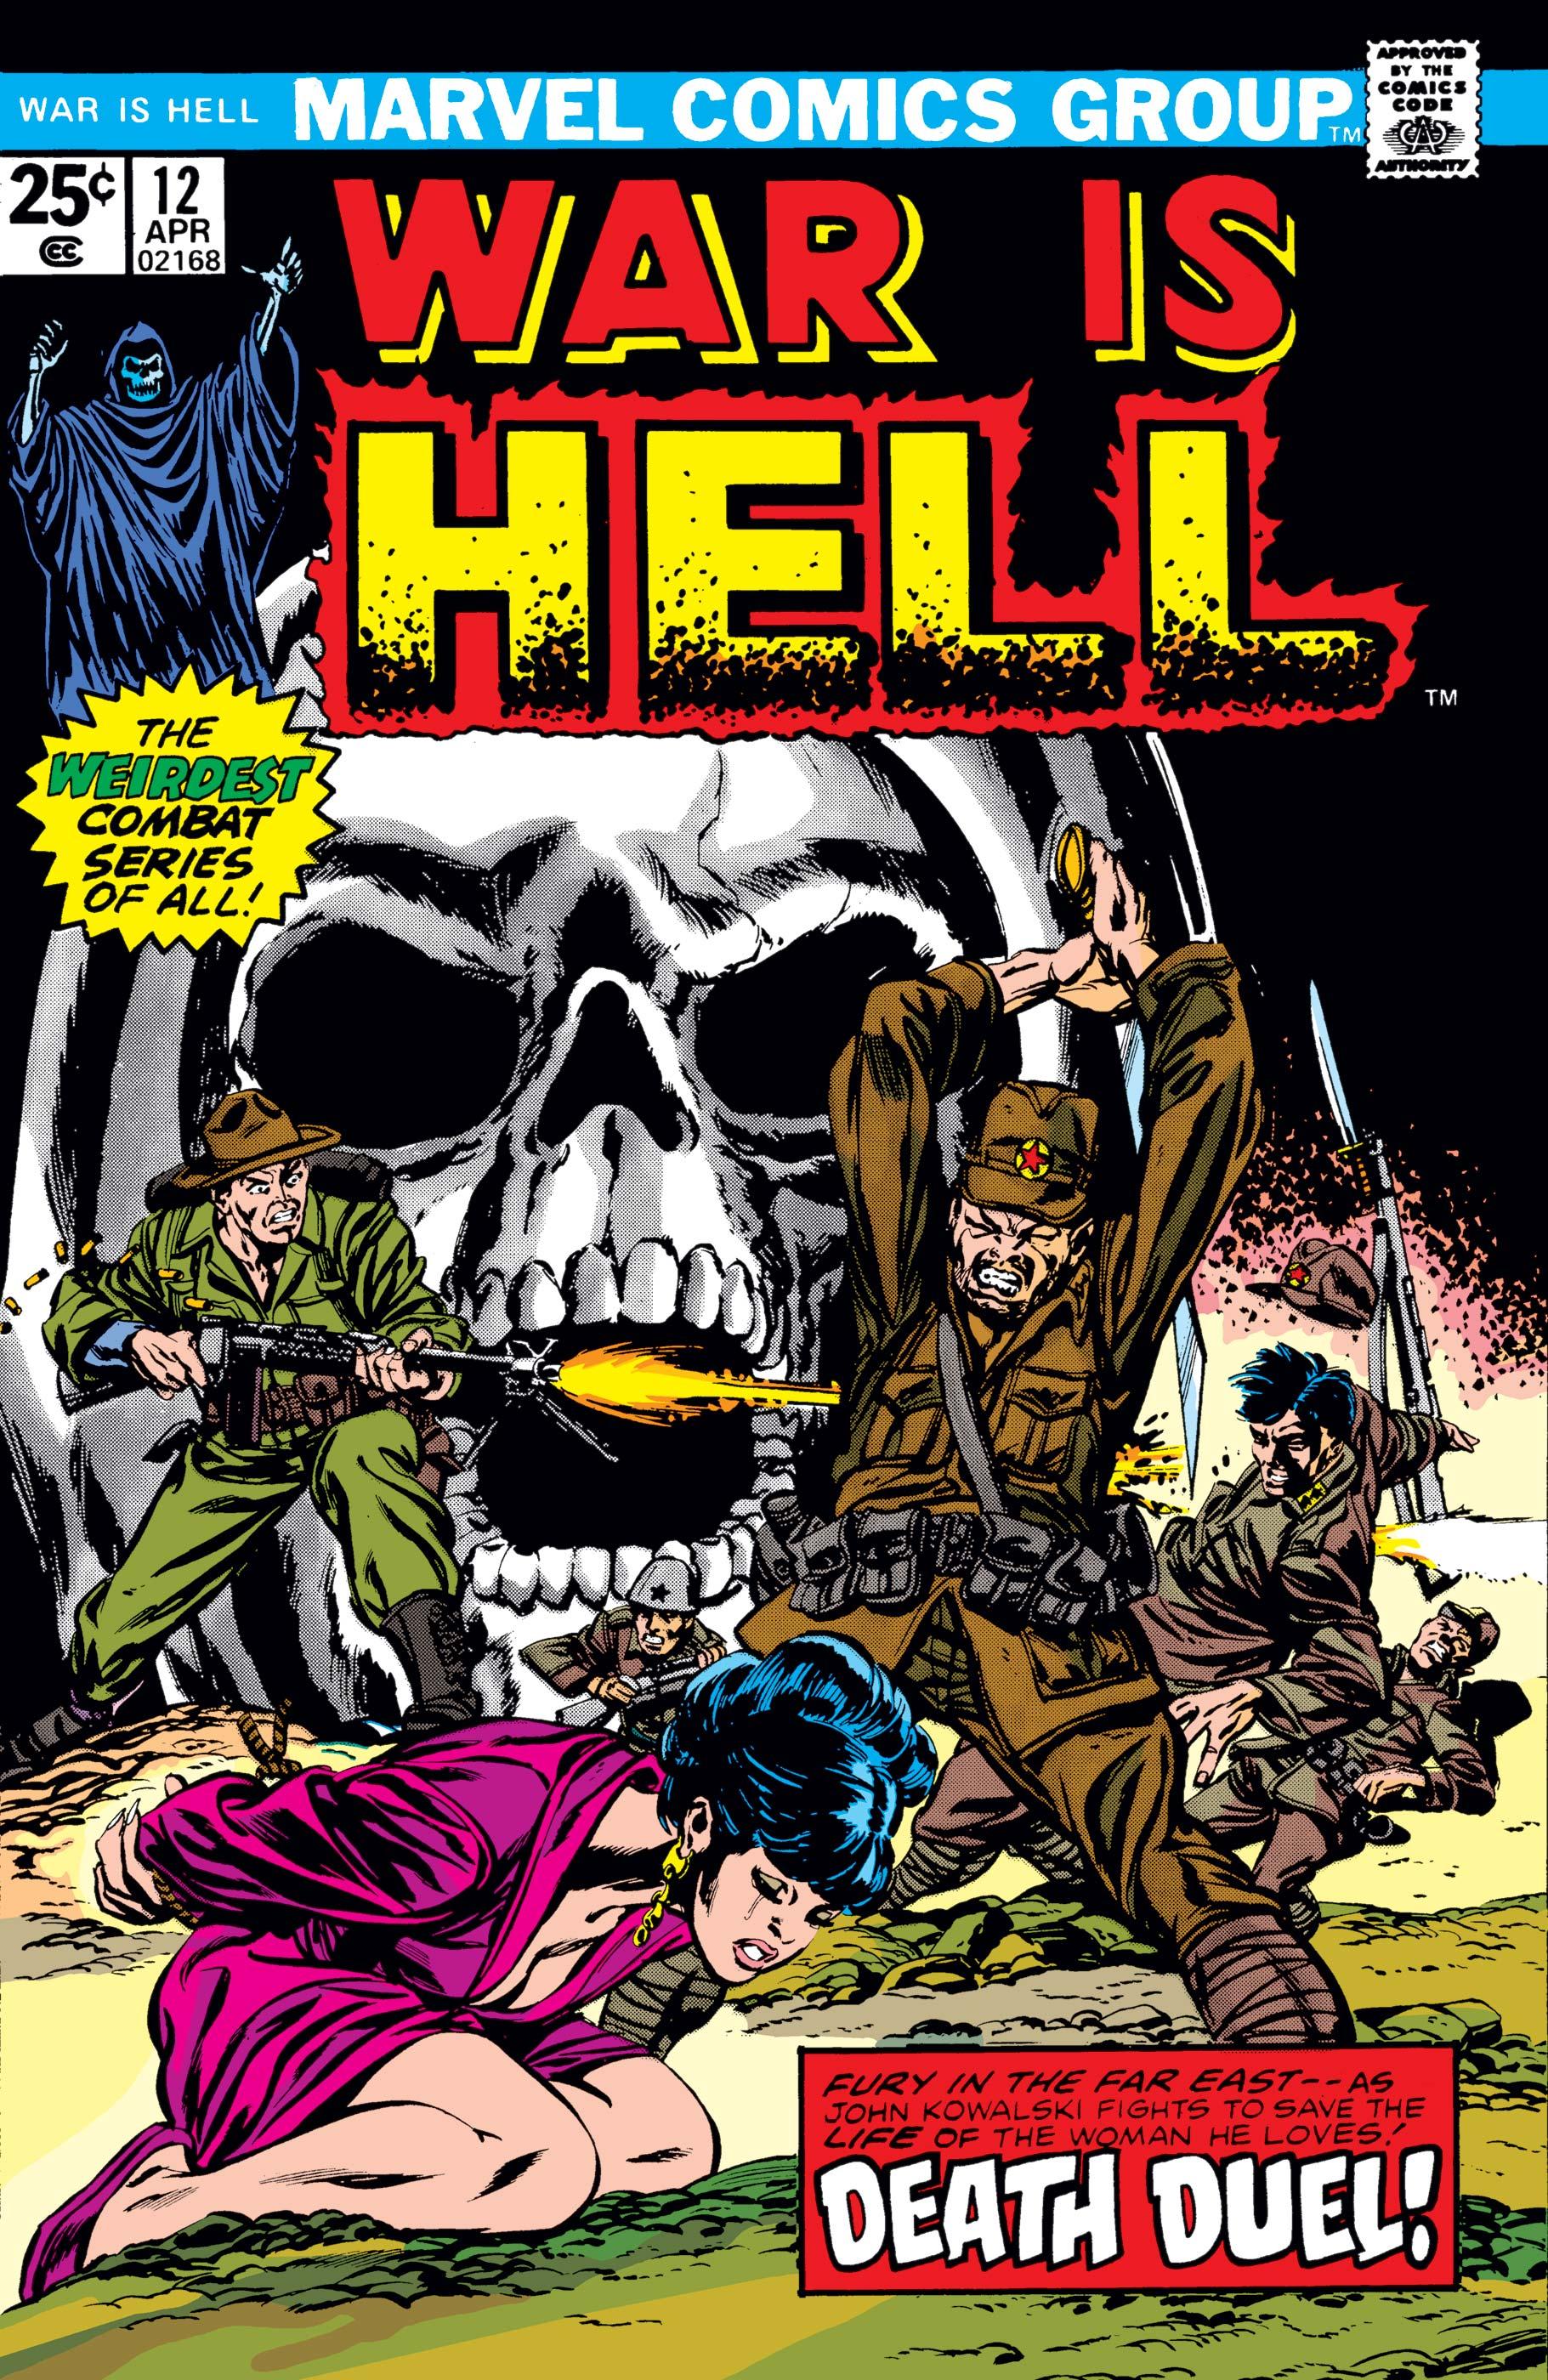 War Is Hell (1973) #12